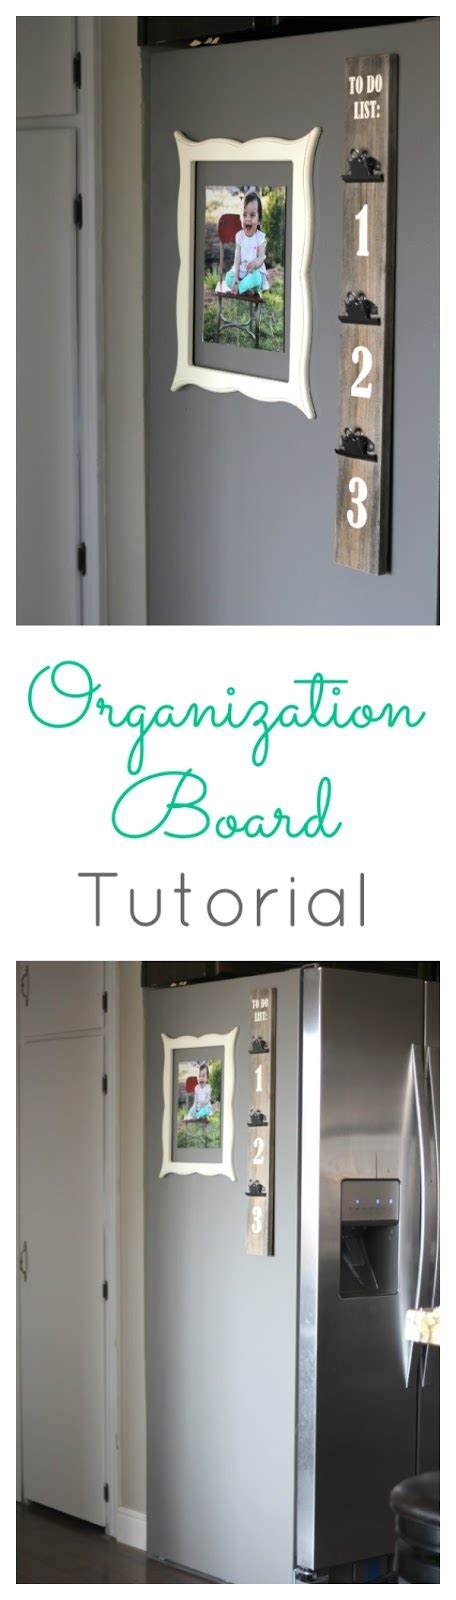 tutorial main instagram organization board tutorial hawthorne and main